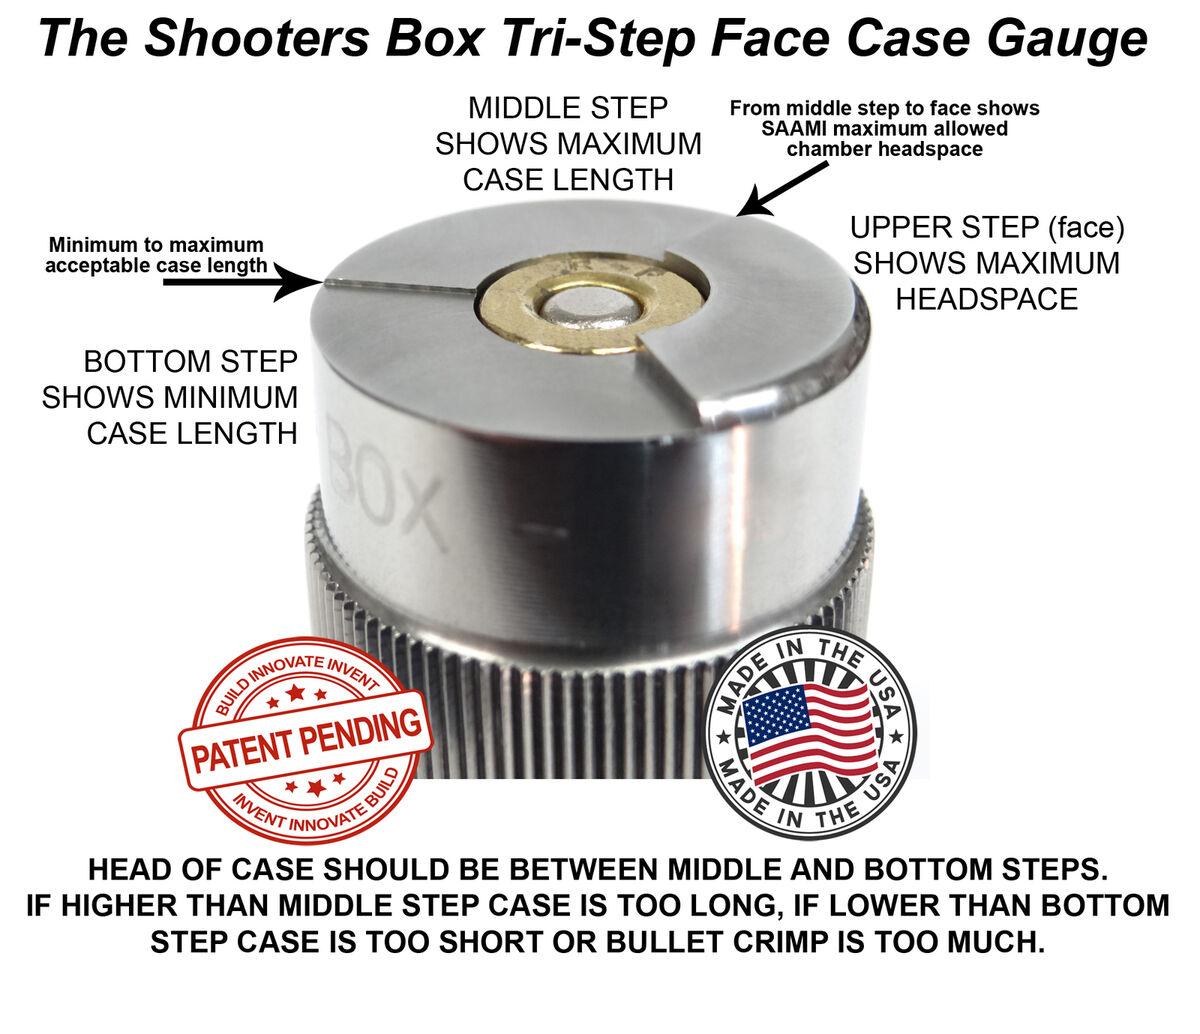 theshootersbox